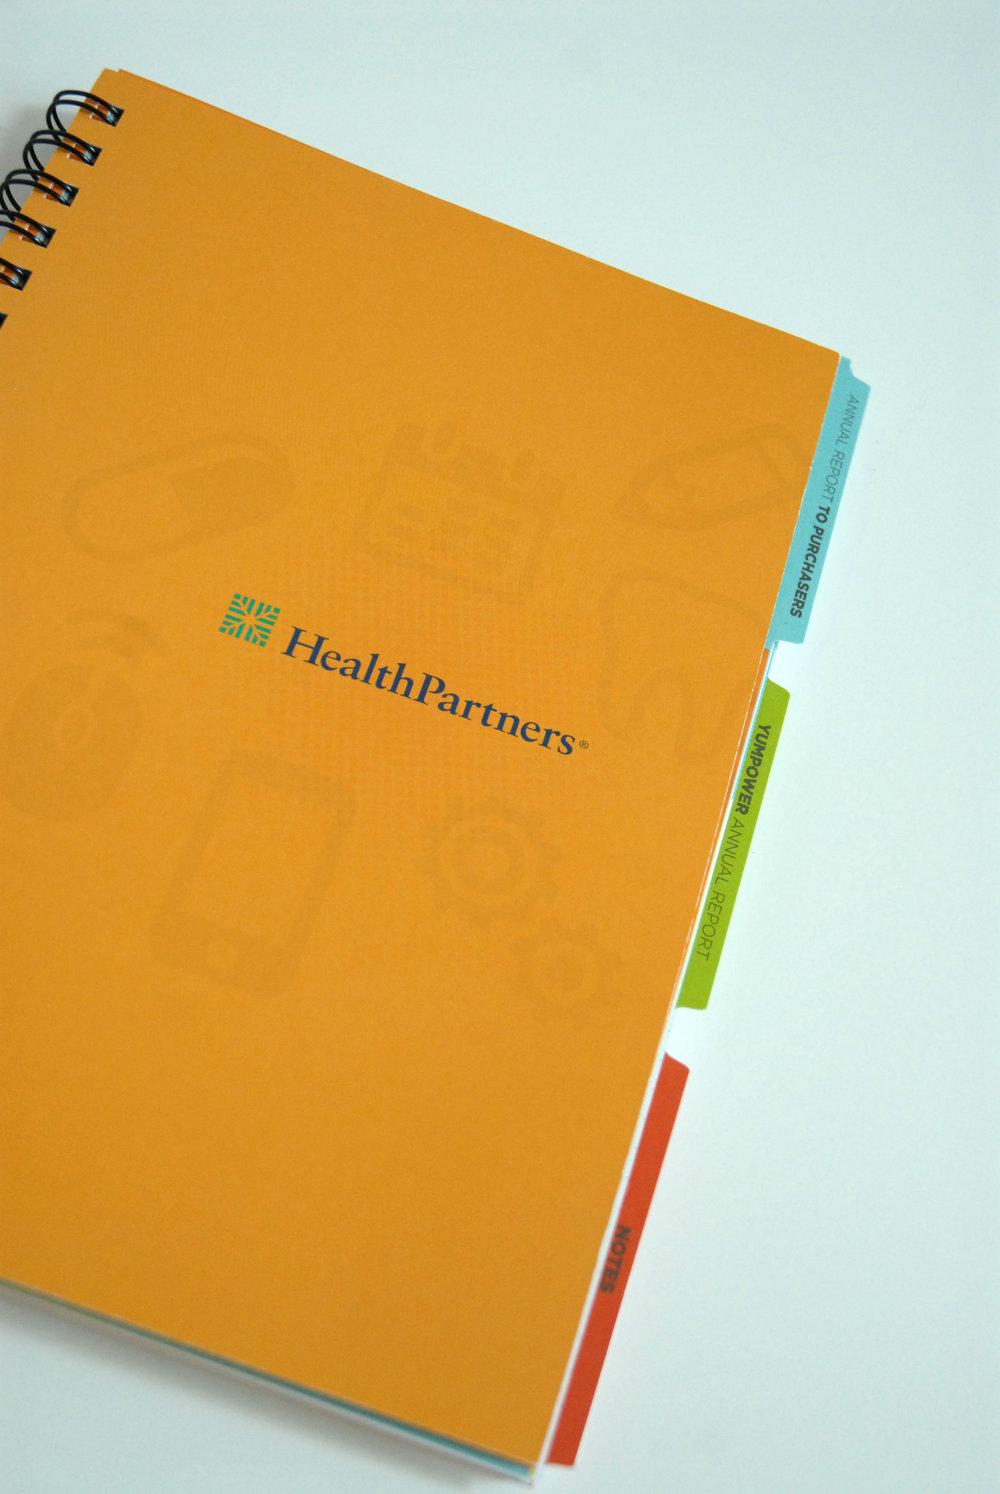 2013NotebookCover.jpg